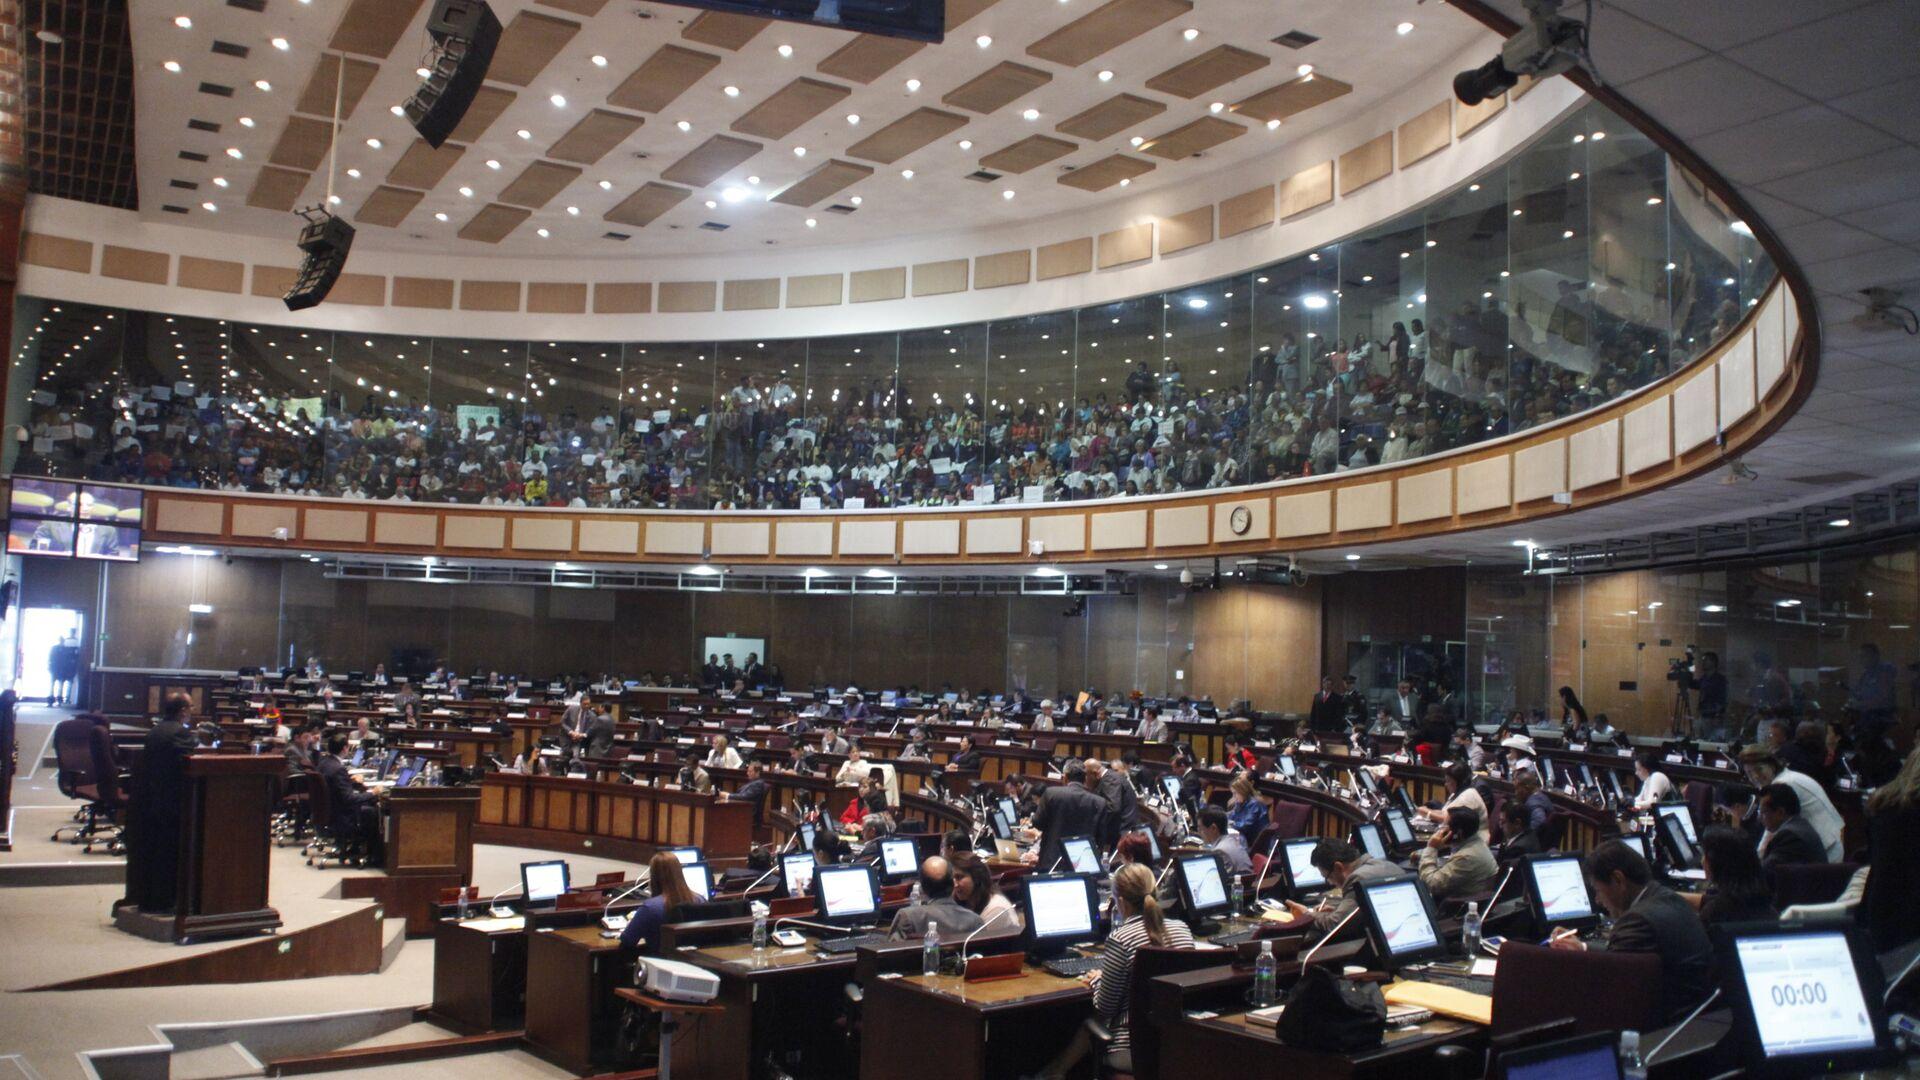 La Asamblea Nacional de Ecuador (archivo) - Sputnik Mundo, 1920, 12.02.2021